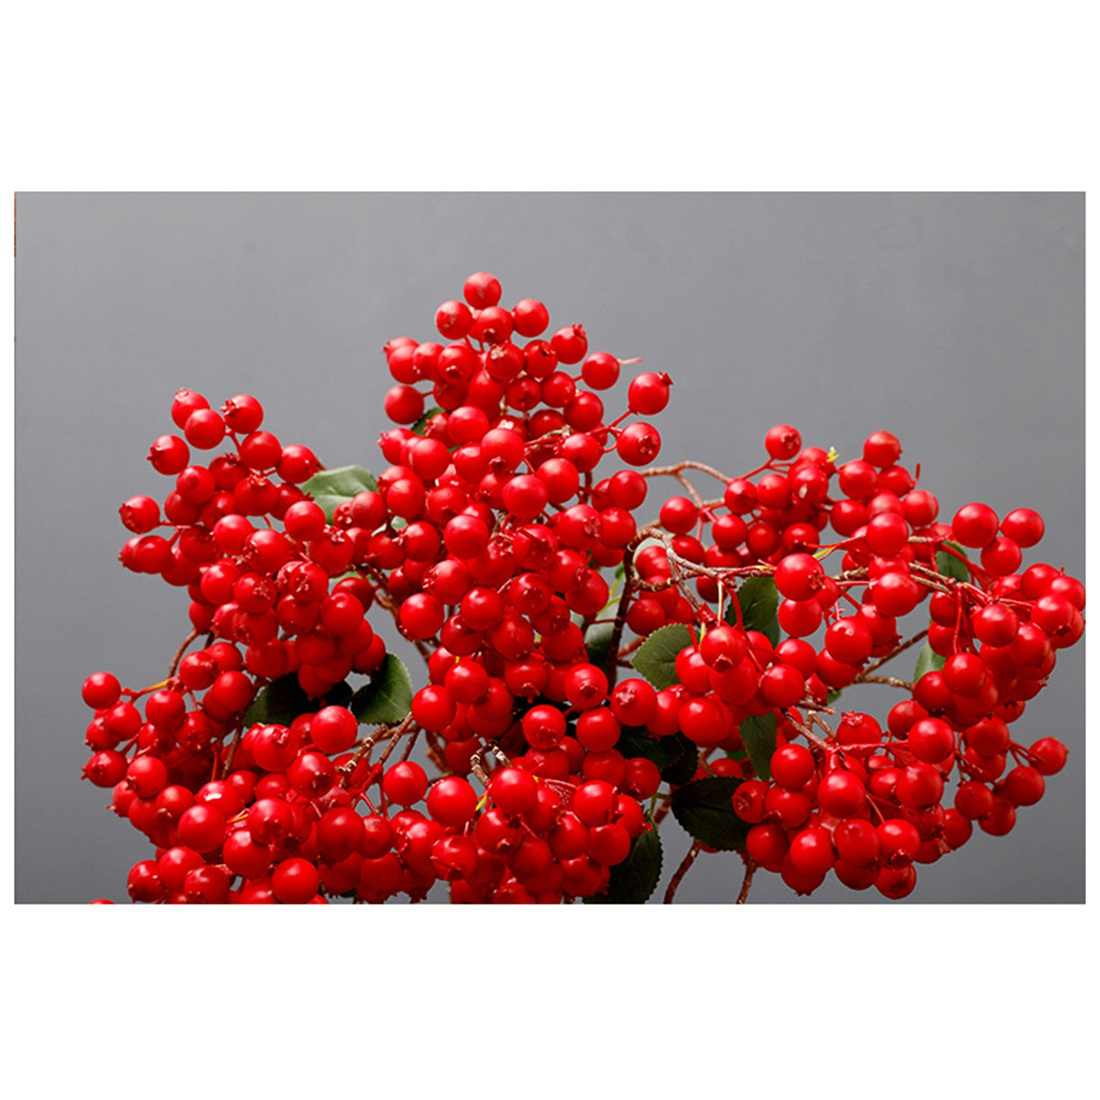 Merah Bouquet Dekorasi Rumah Eropa Kekasih Buah Besar Cabang Acacia Buah Rumah Hotel Dekorasi Pernikahan Photogr